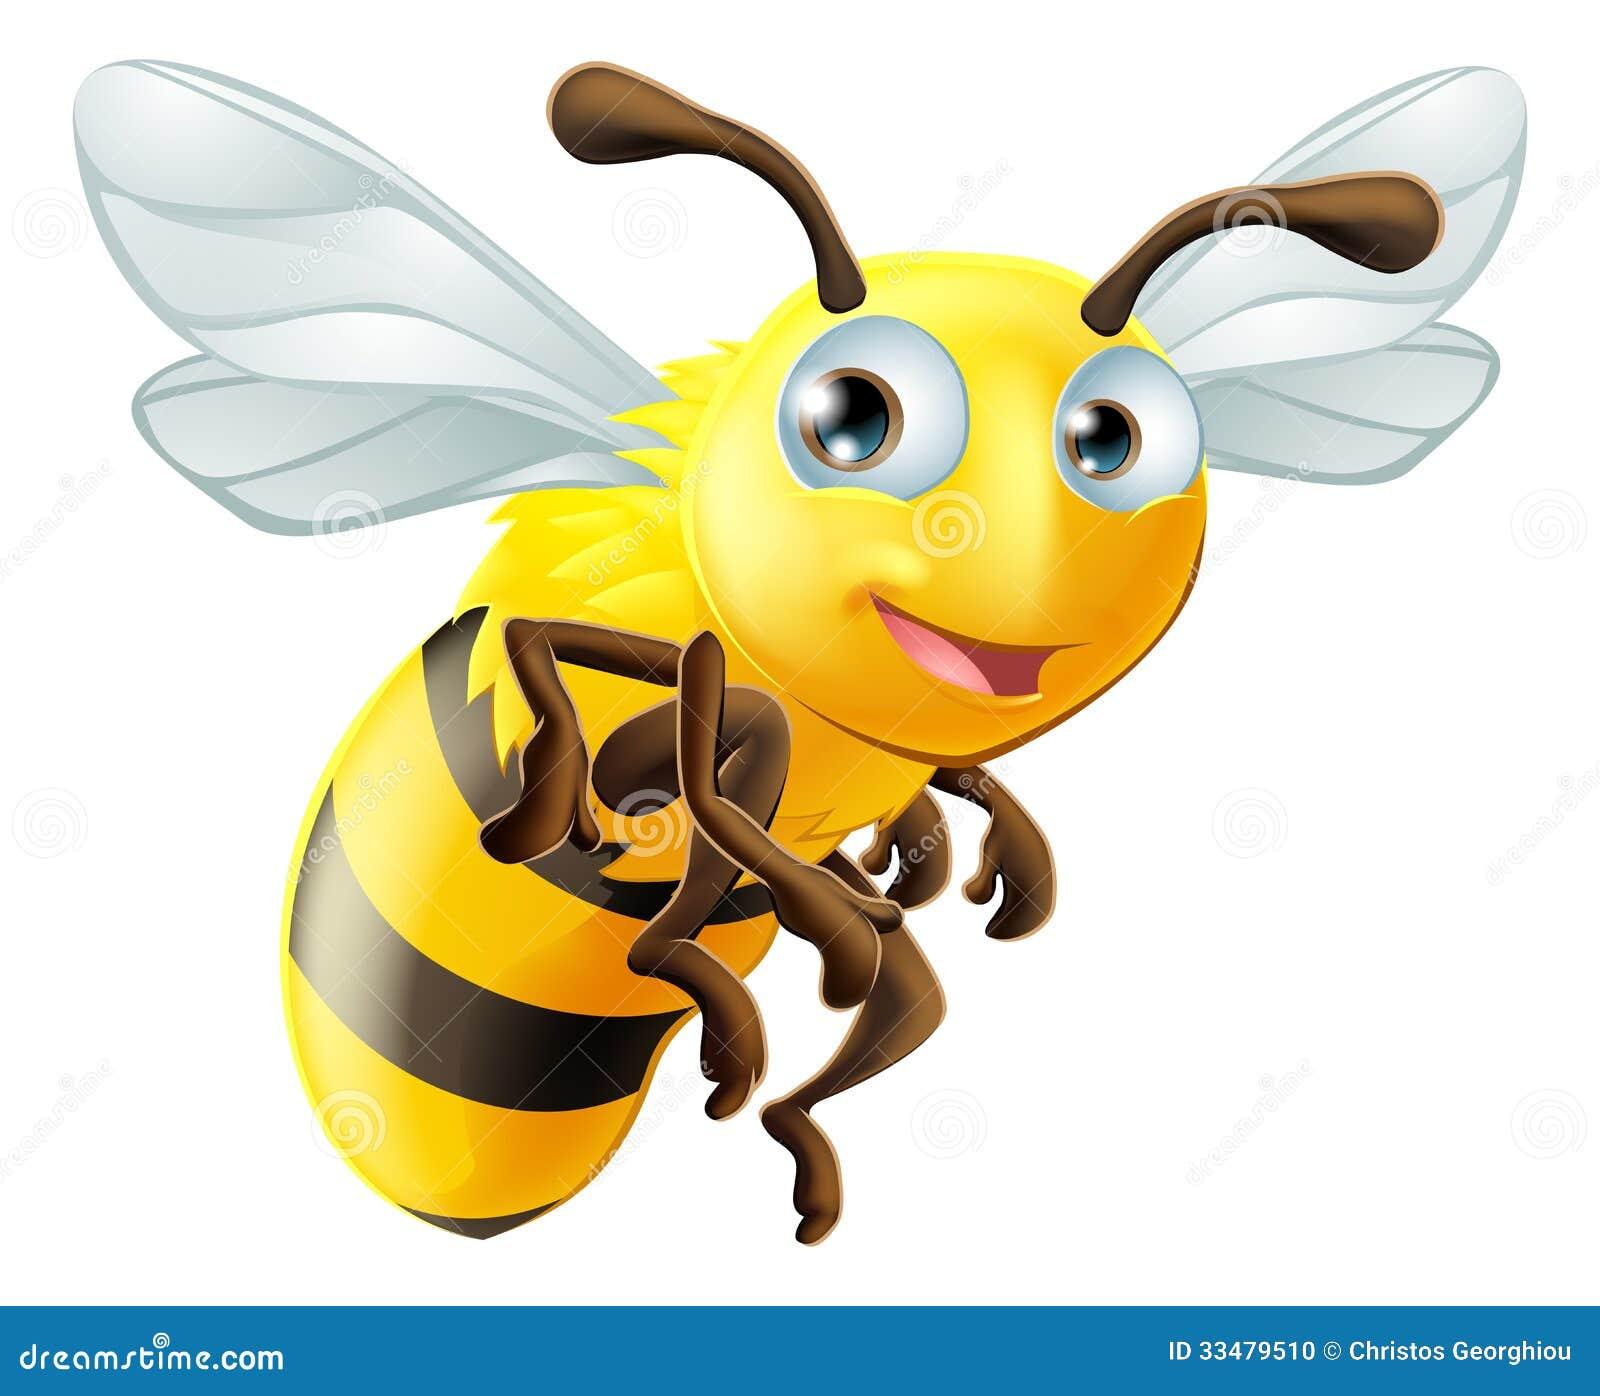 Cartoon Bee Stock Photo - Image: 33479510